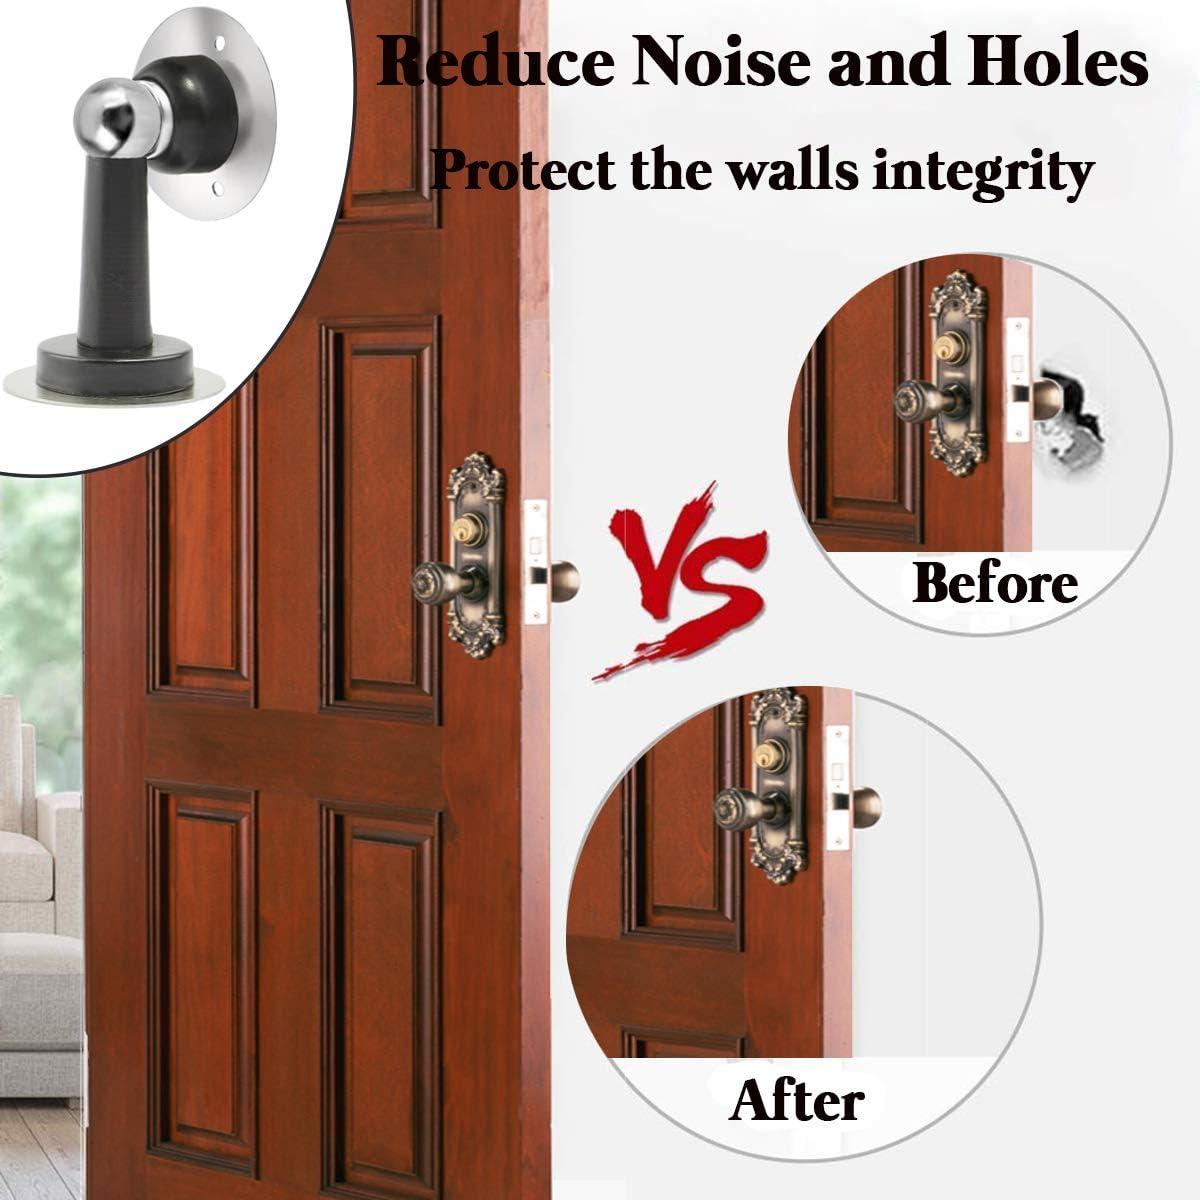 Screws for Stronger Mount Silver Stainless Steel Door Holder with Double Sided Sticker,No Drilling 2 Pack Magnetic Door Stop Catch Hold Your Door Open Door Stopper